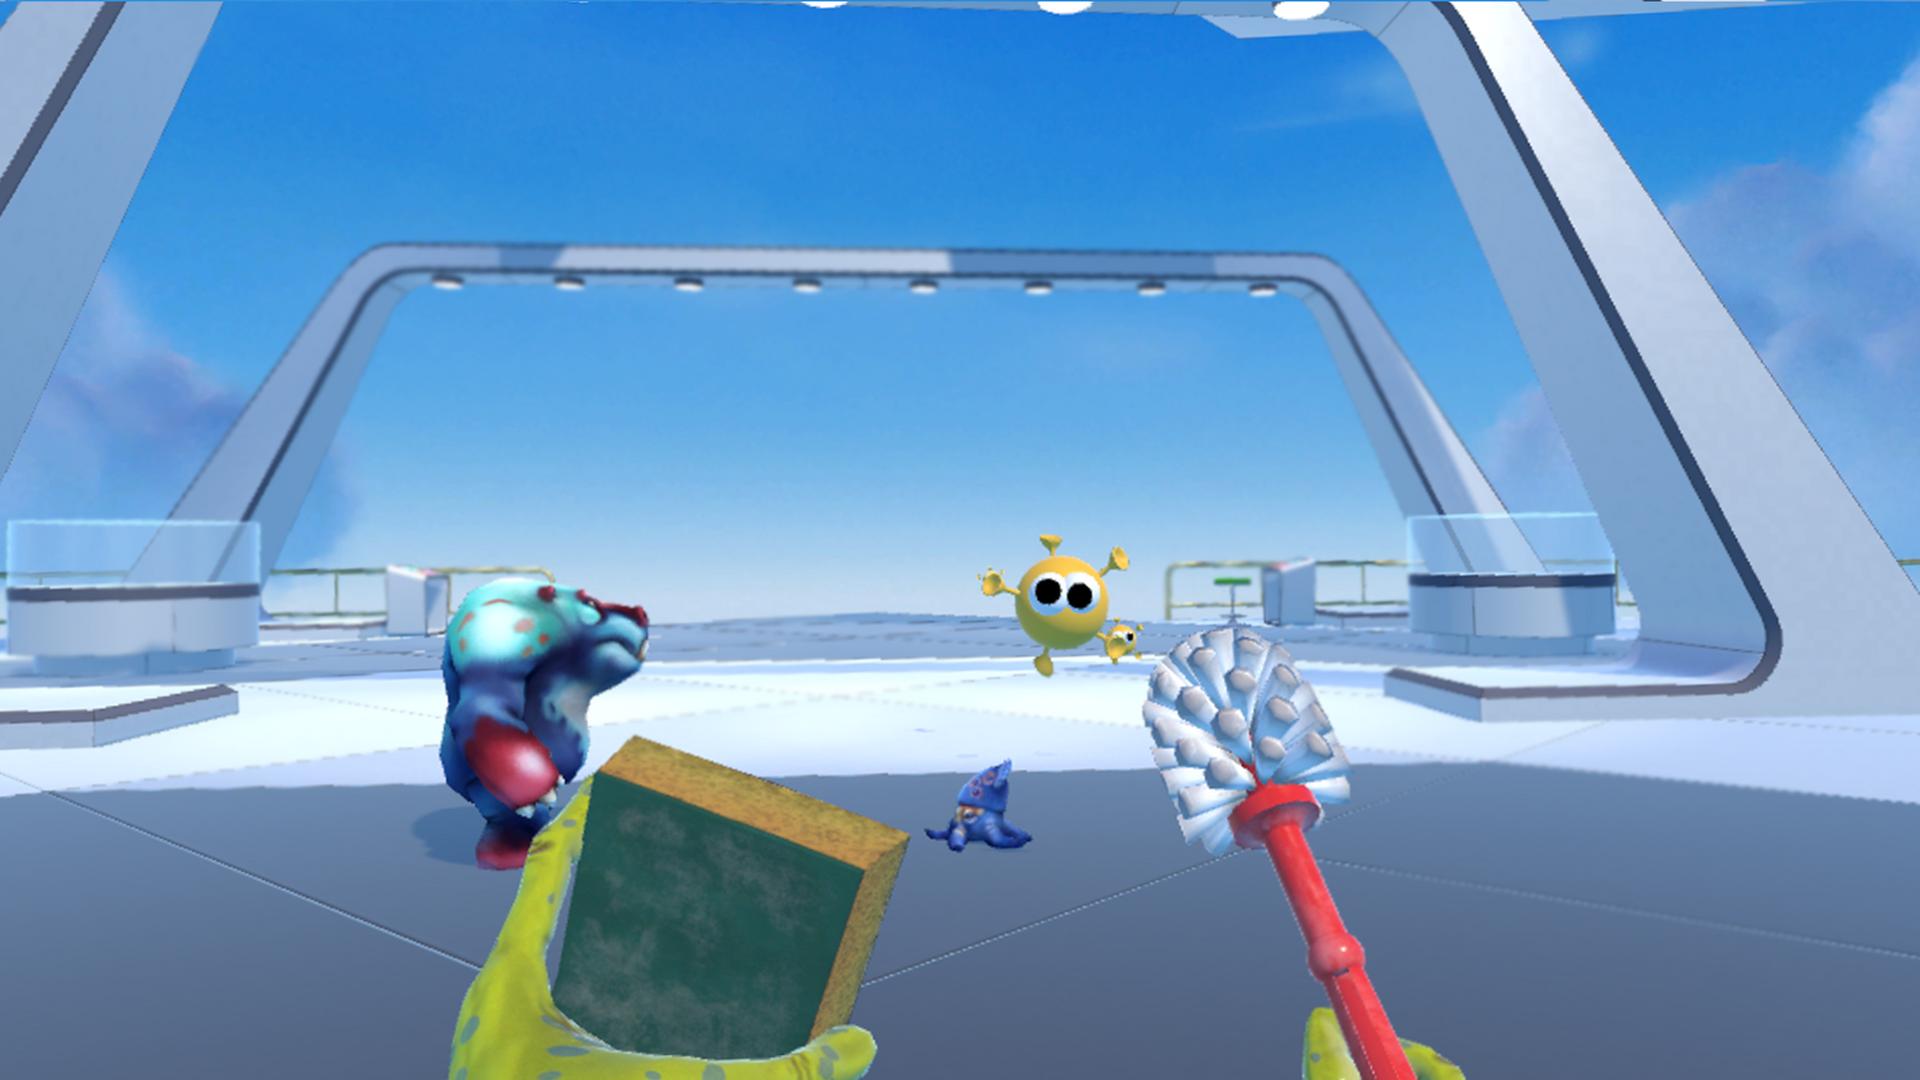 Virus Popper Screenshot 2.png